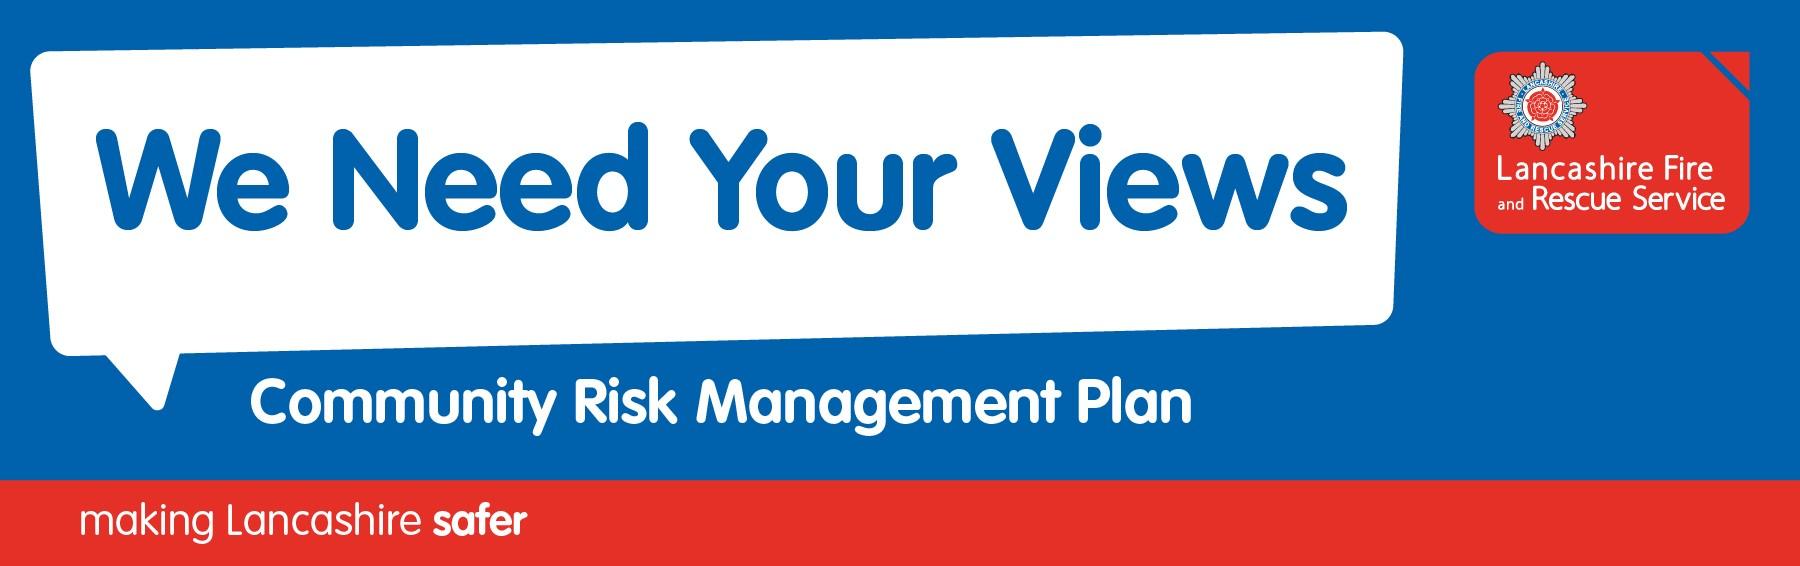 Community Risk Management Plan